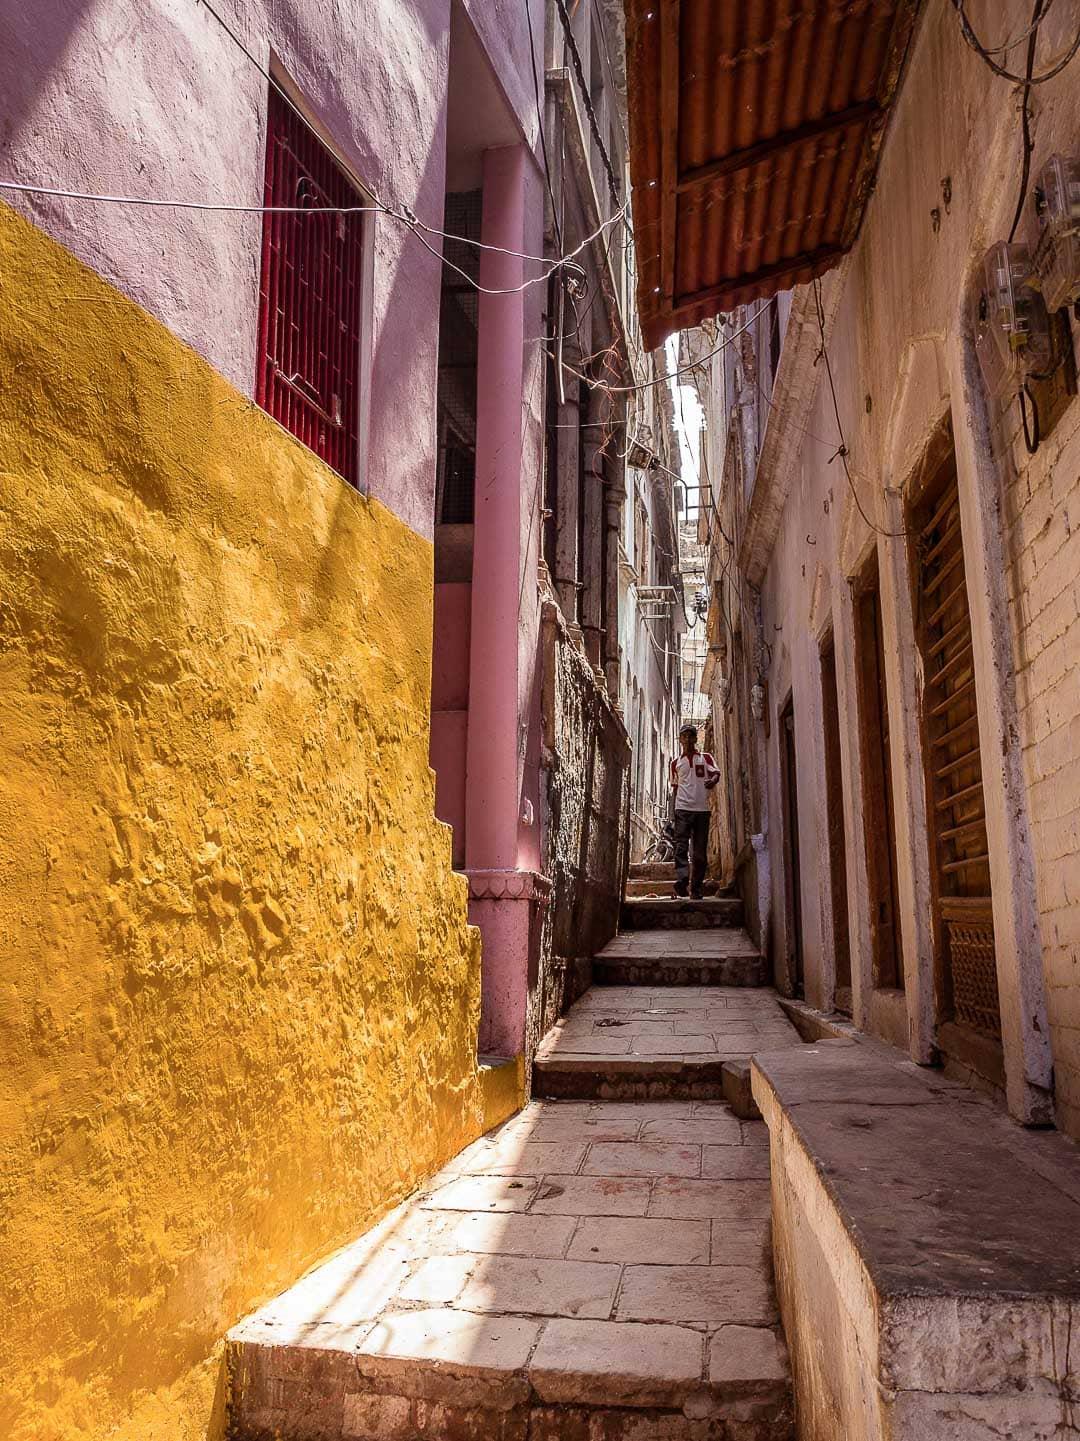 A man walks down a colorful alleyway in Varanasi India